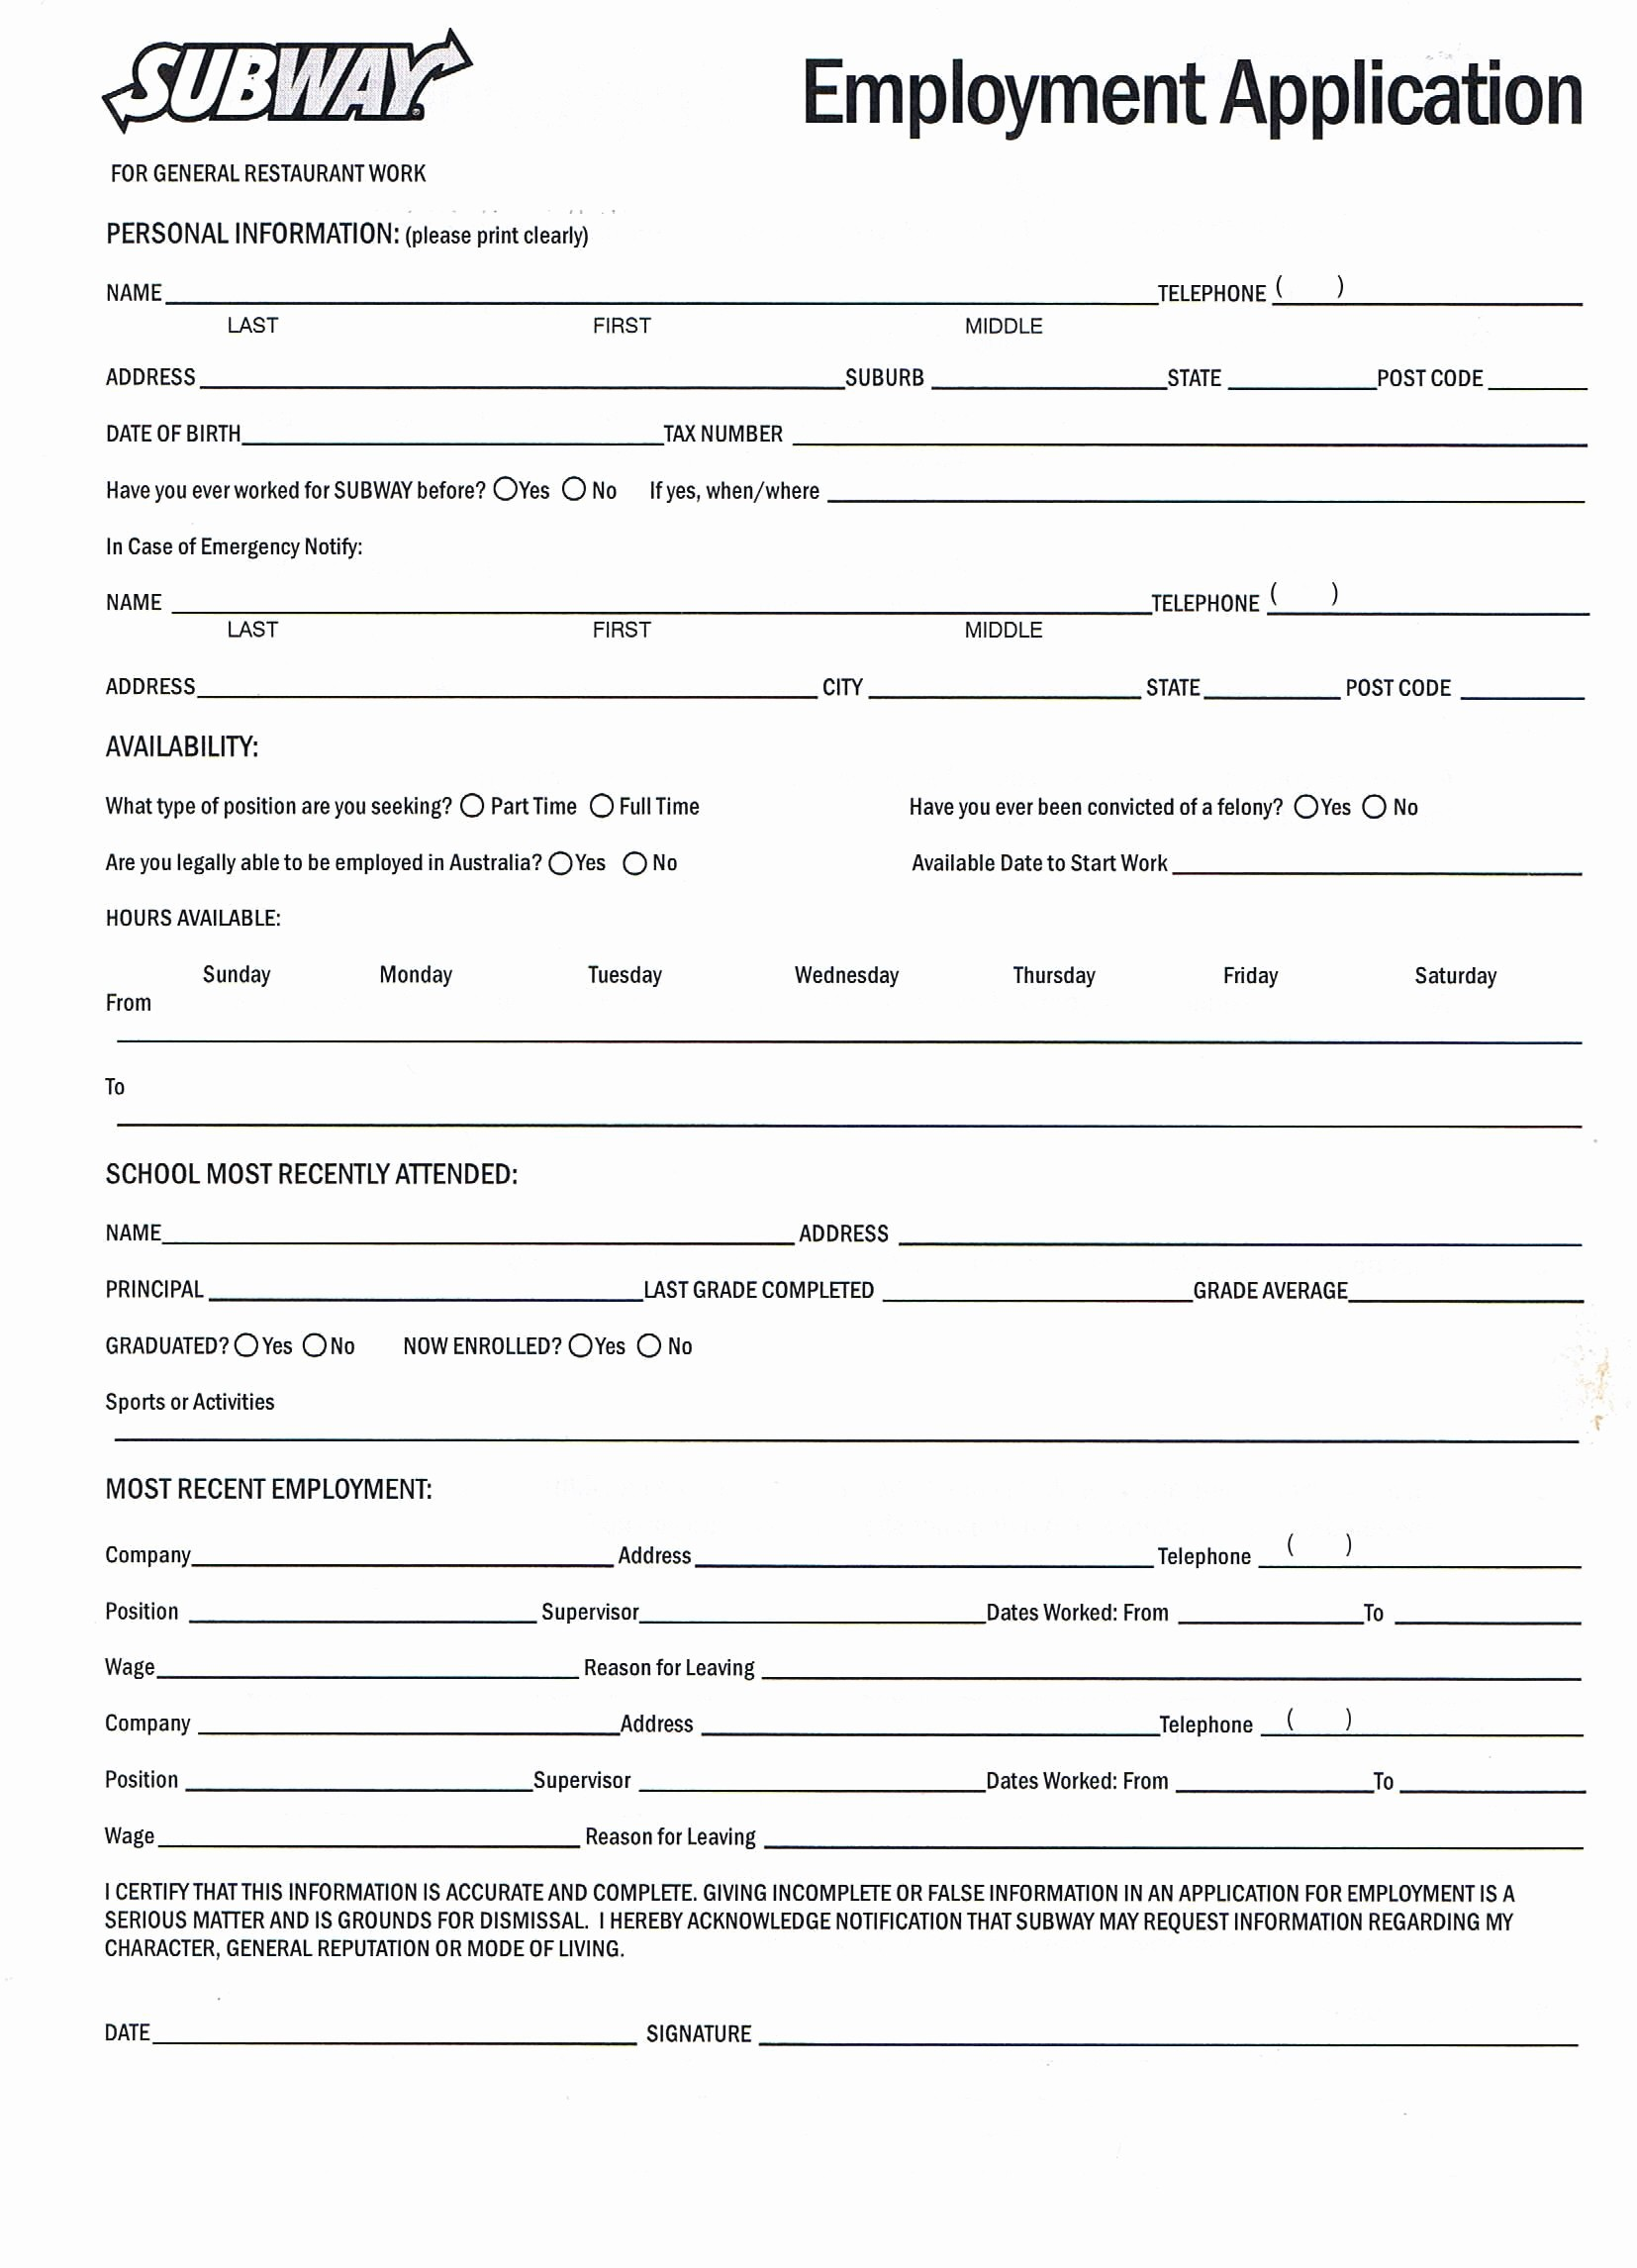 Job Application form Sample format Fresh Printable Job Application forms Online forms Download and